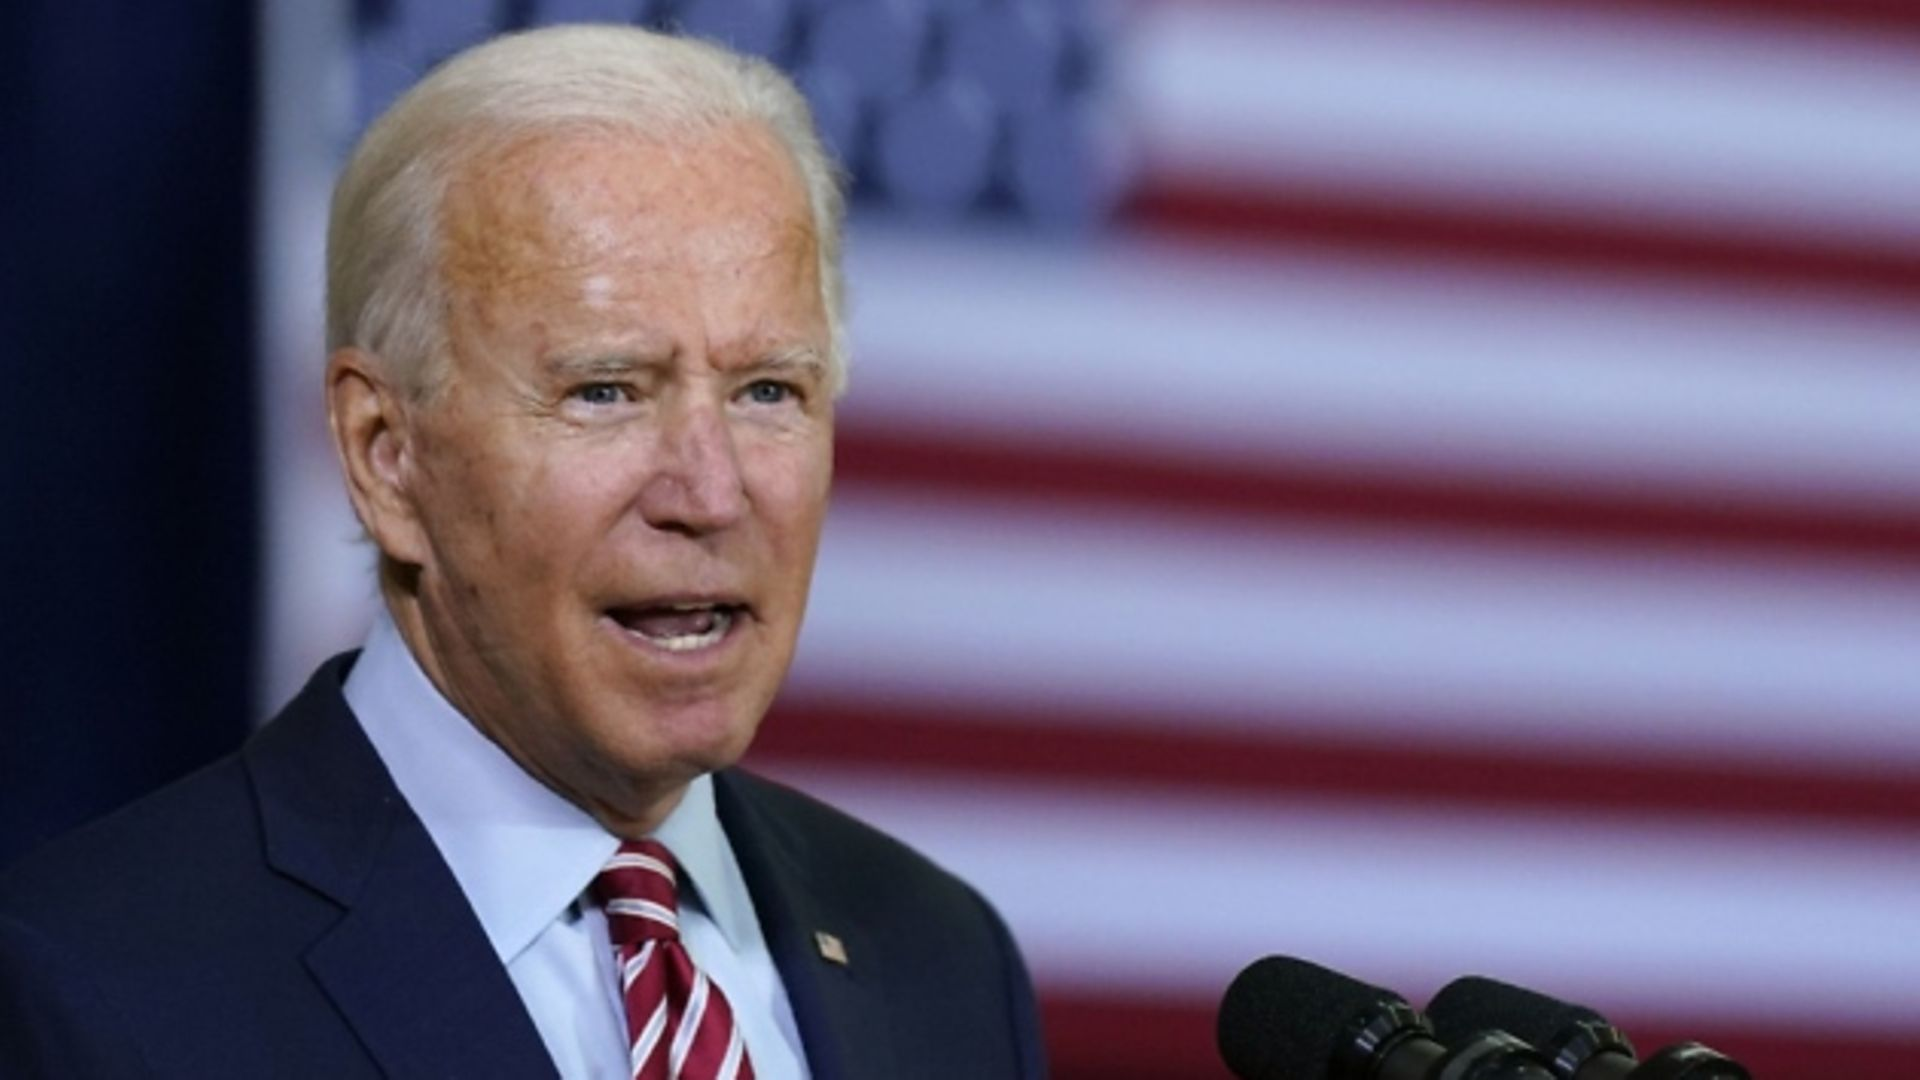 Better than any form of Trump: Joe Biden - Credit: AP Photo/Patrick Semansky